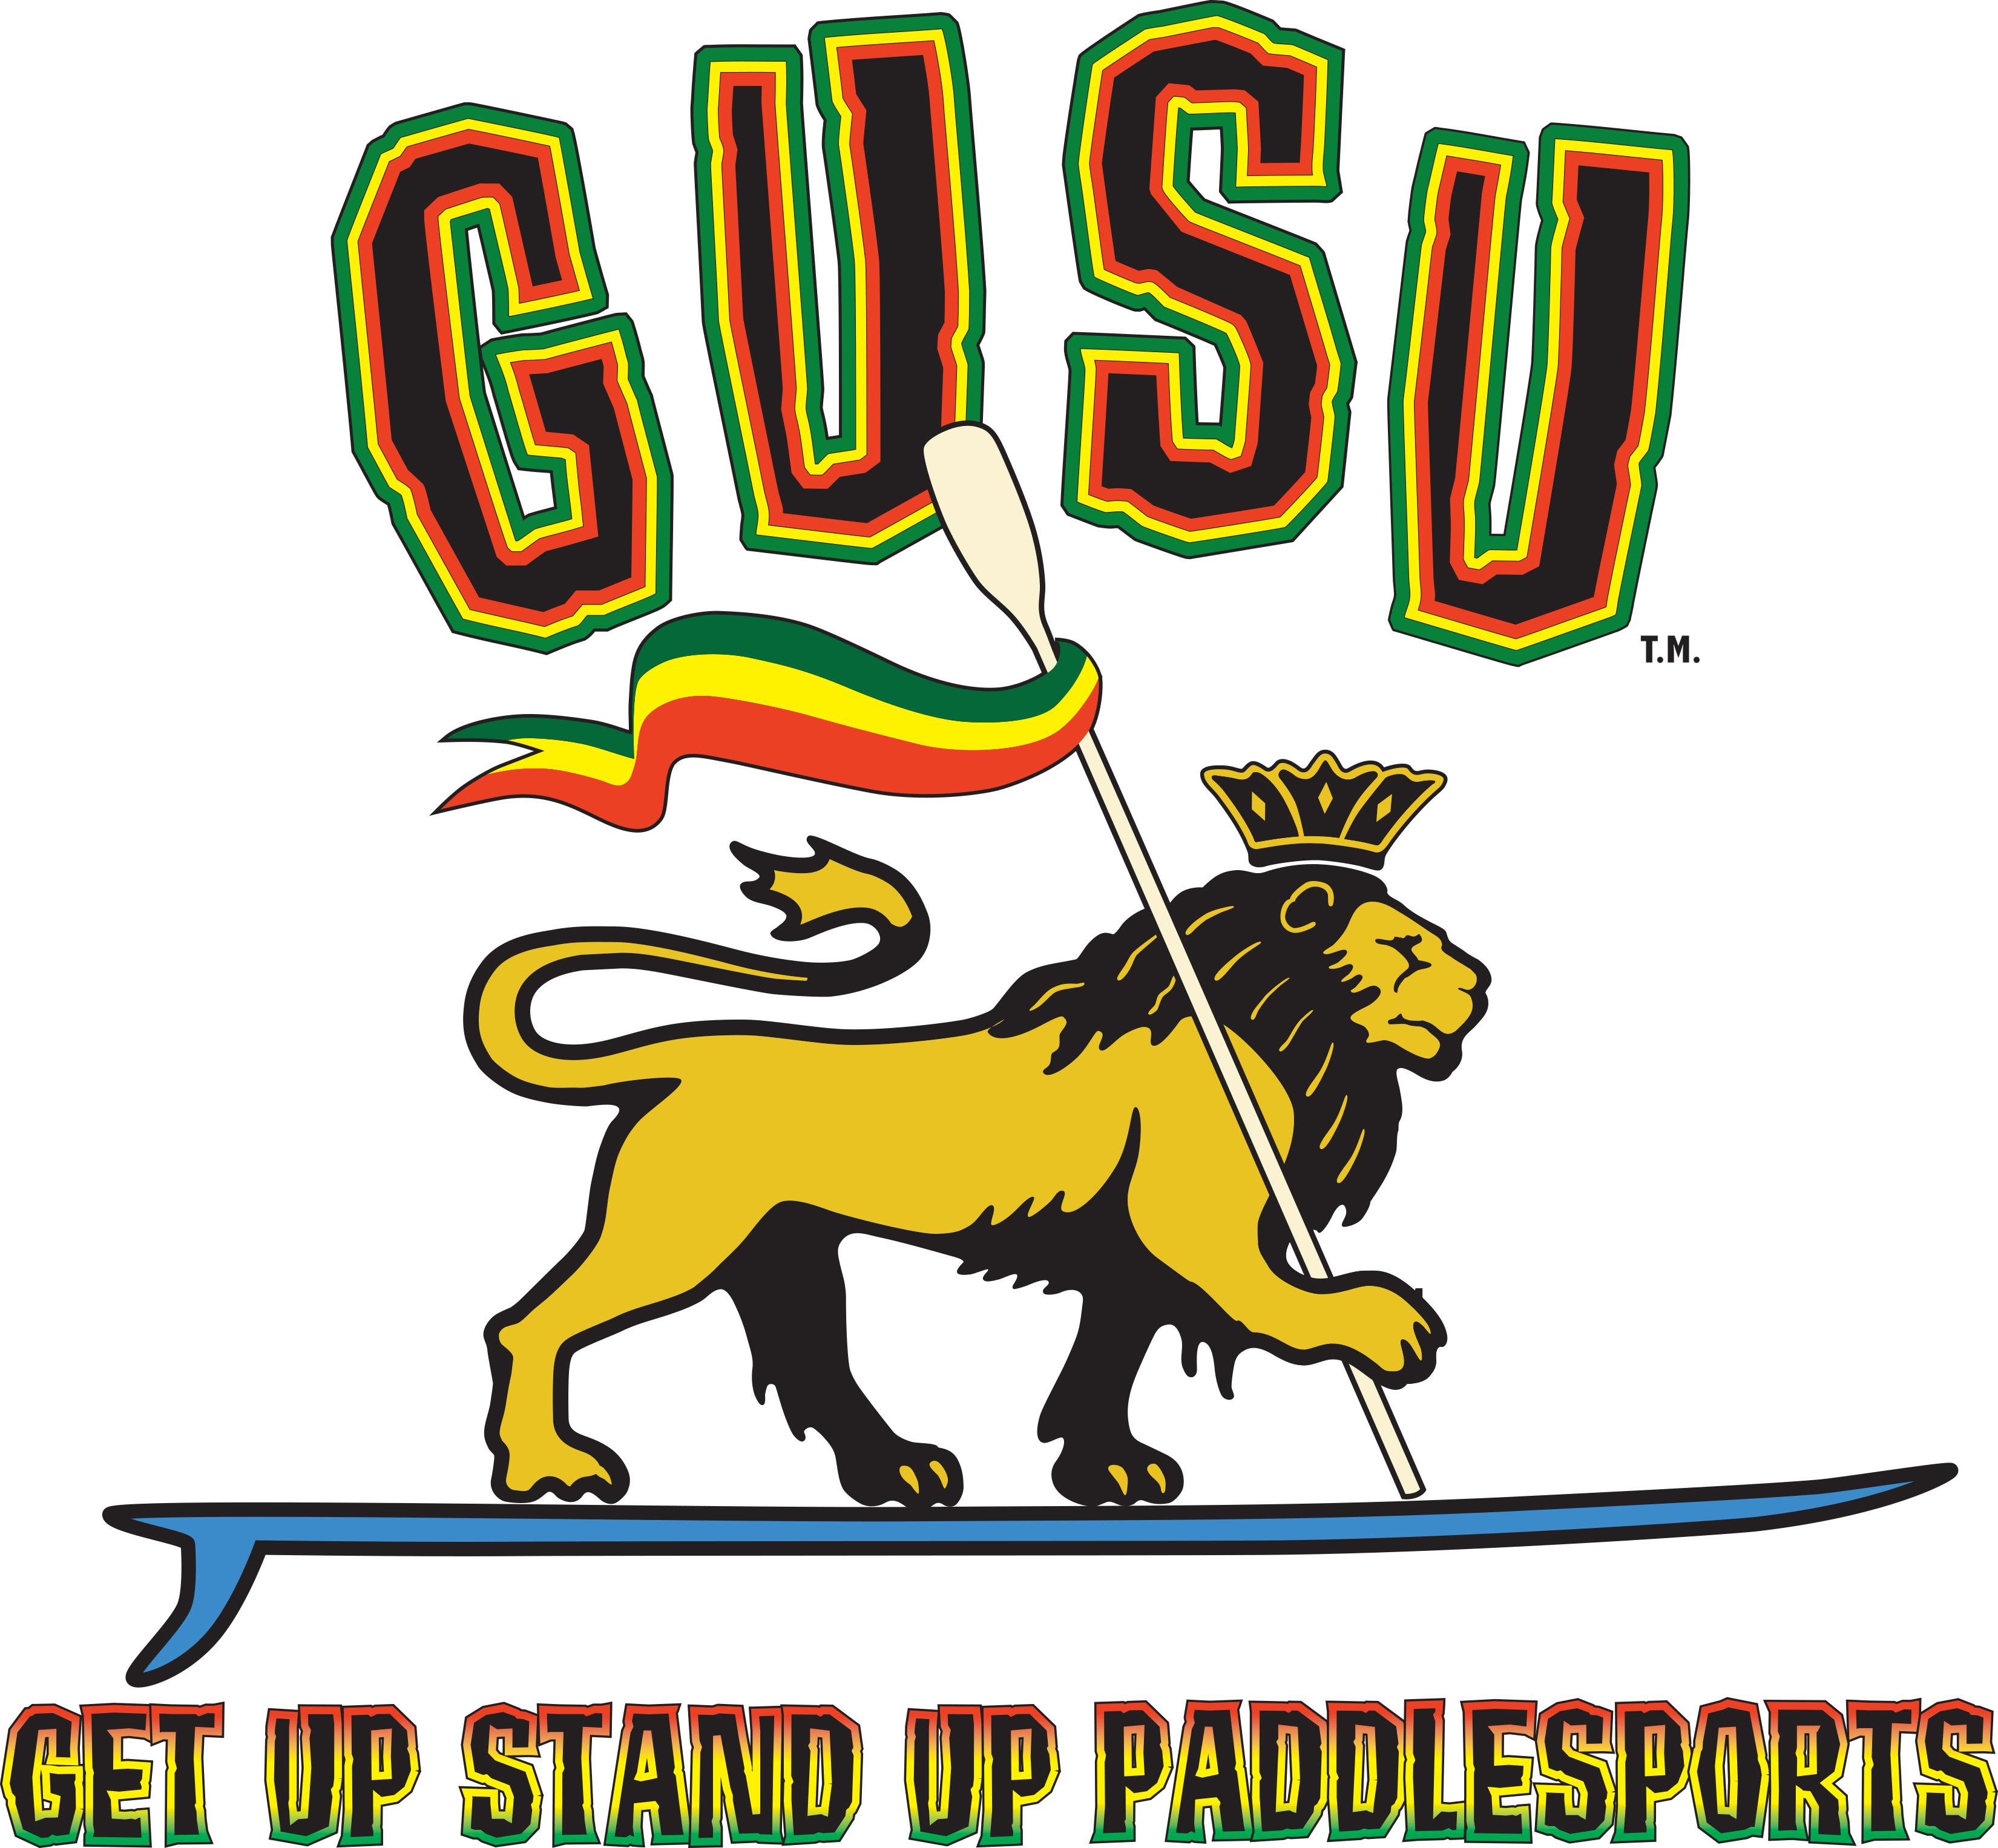 GUSU Stand Up Paddle Sports